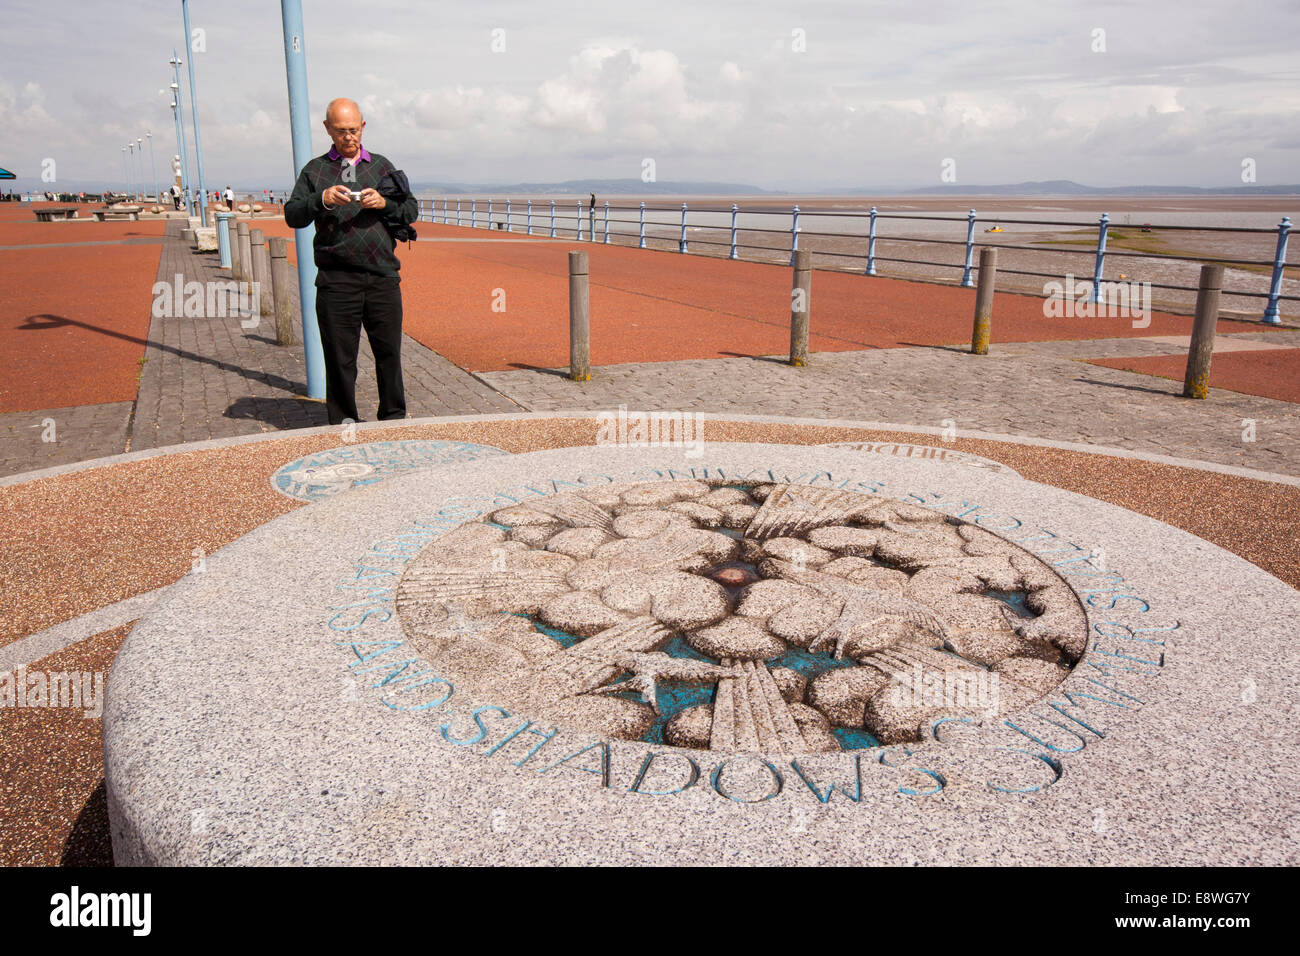 UK, England, Lancashire, Morecambe, Stone Jetty, Tern Project tongue twisters sculpture - Stock Image